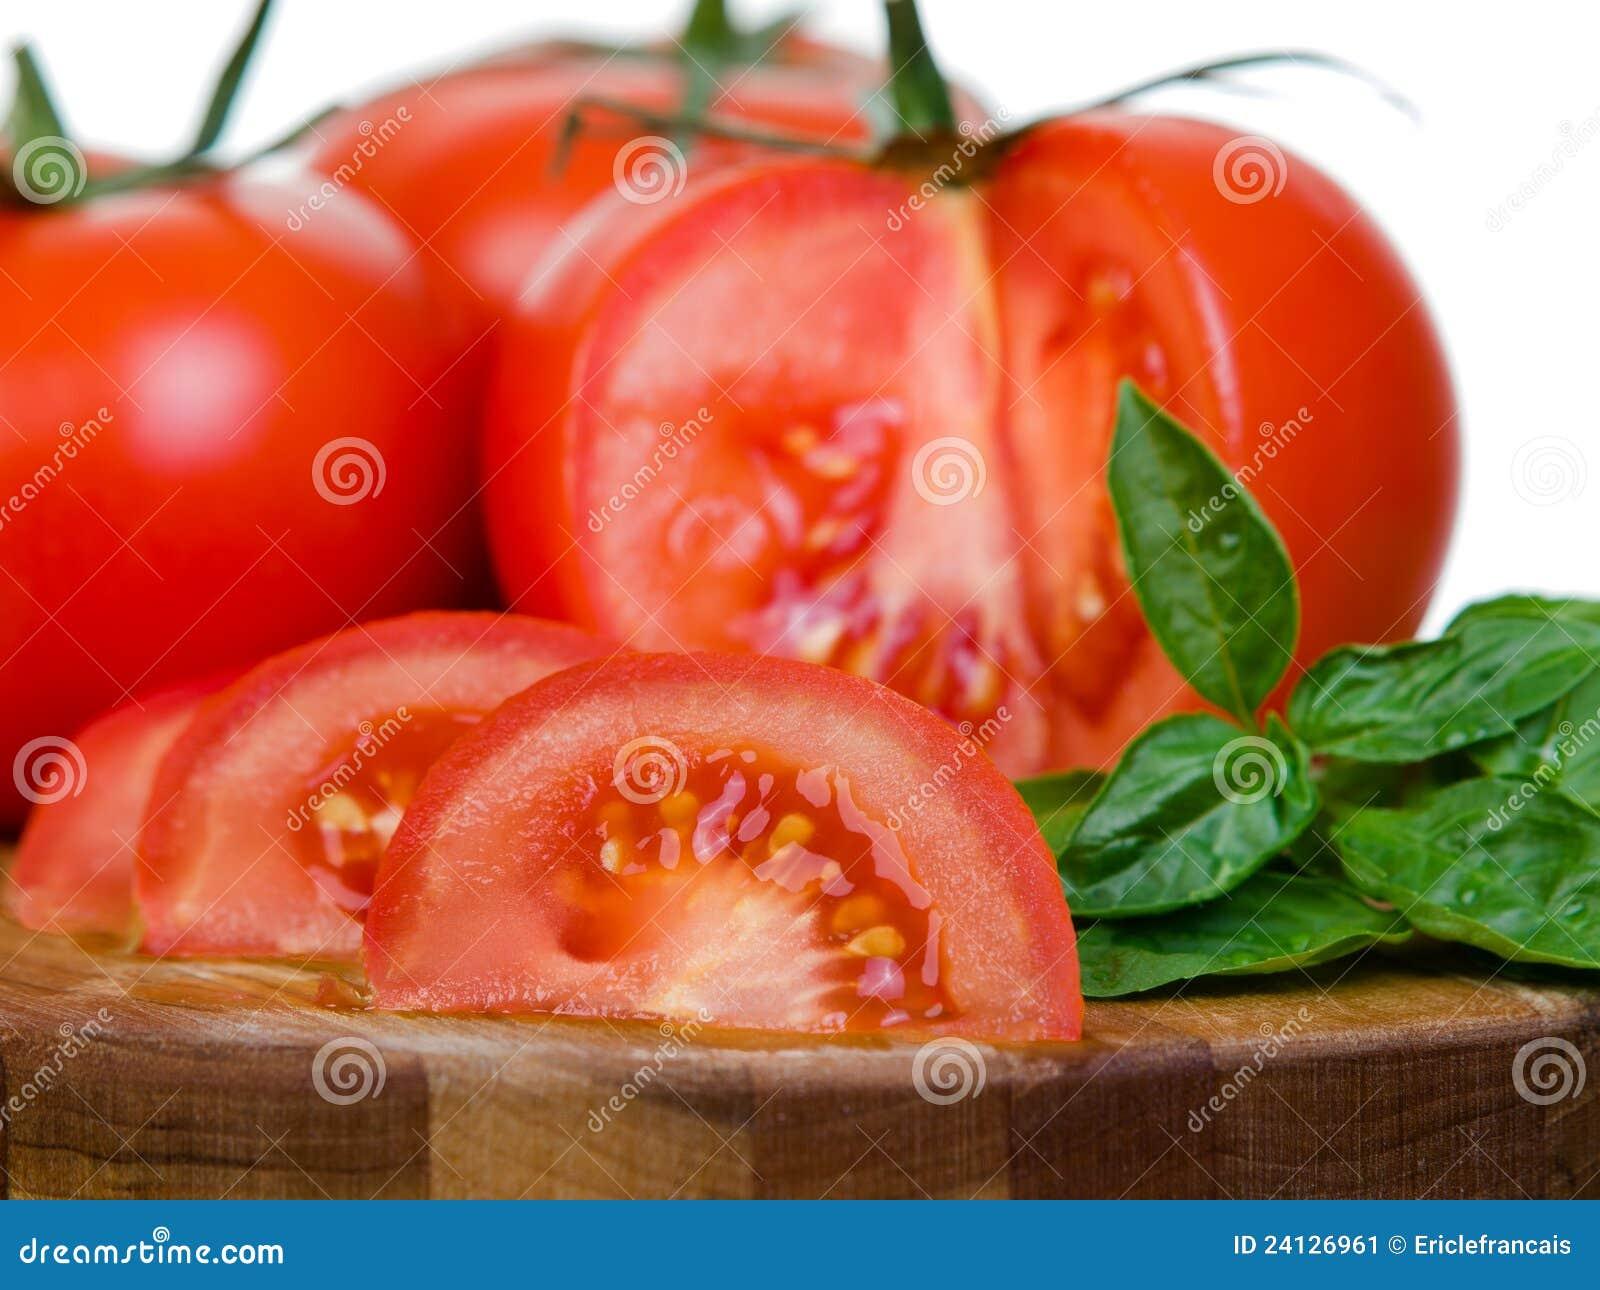 Tomatoes presentation sliced on wooden plank macro stock